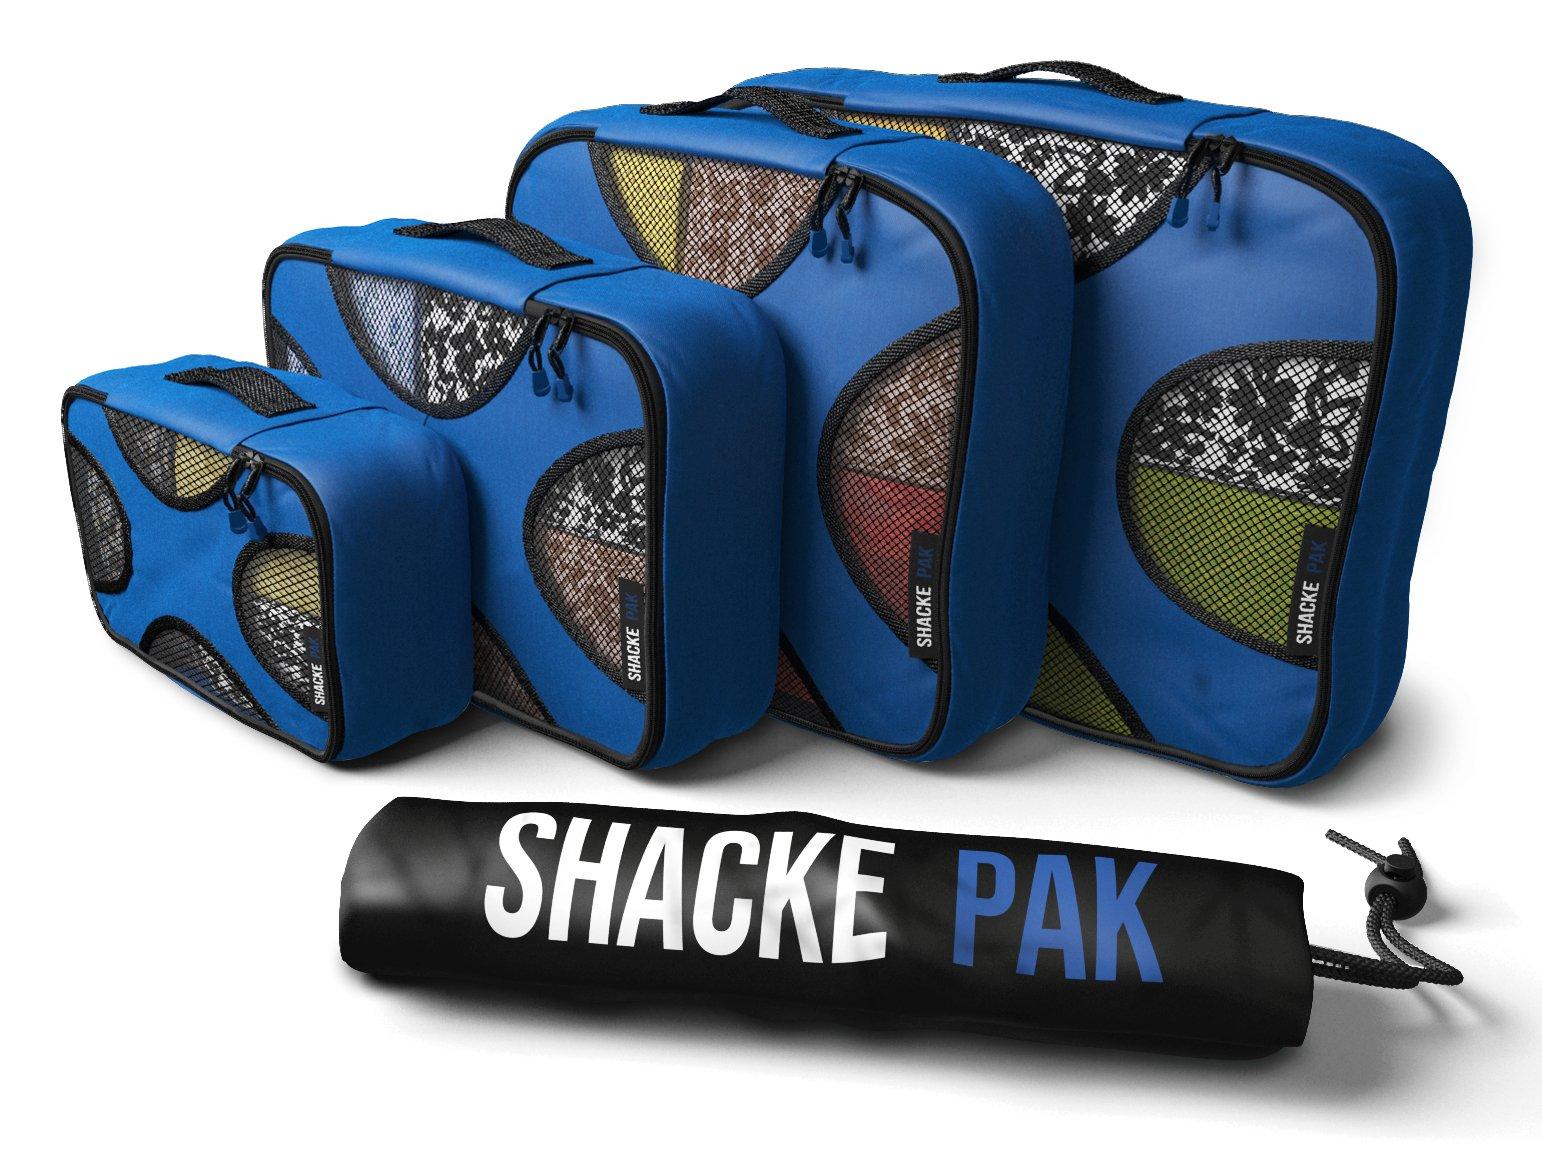 Shacke Pak - 4 Set Packing Cubes - Travel Organizers with Laundry Bag (Gentlemen's Blue)